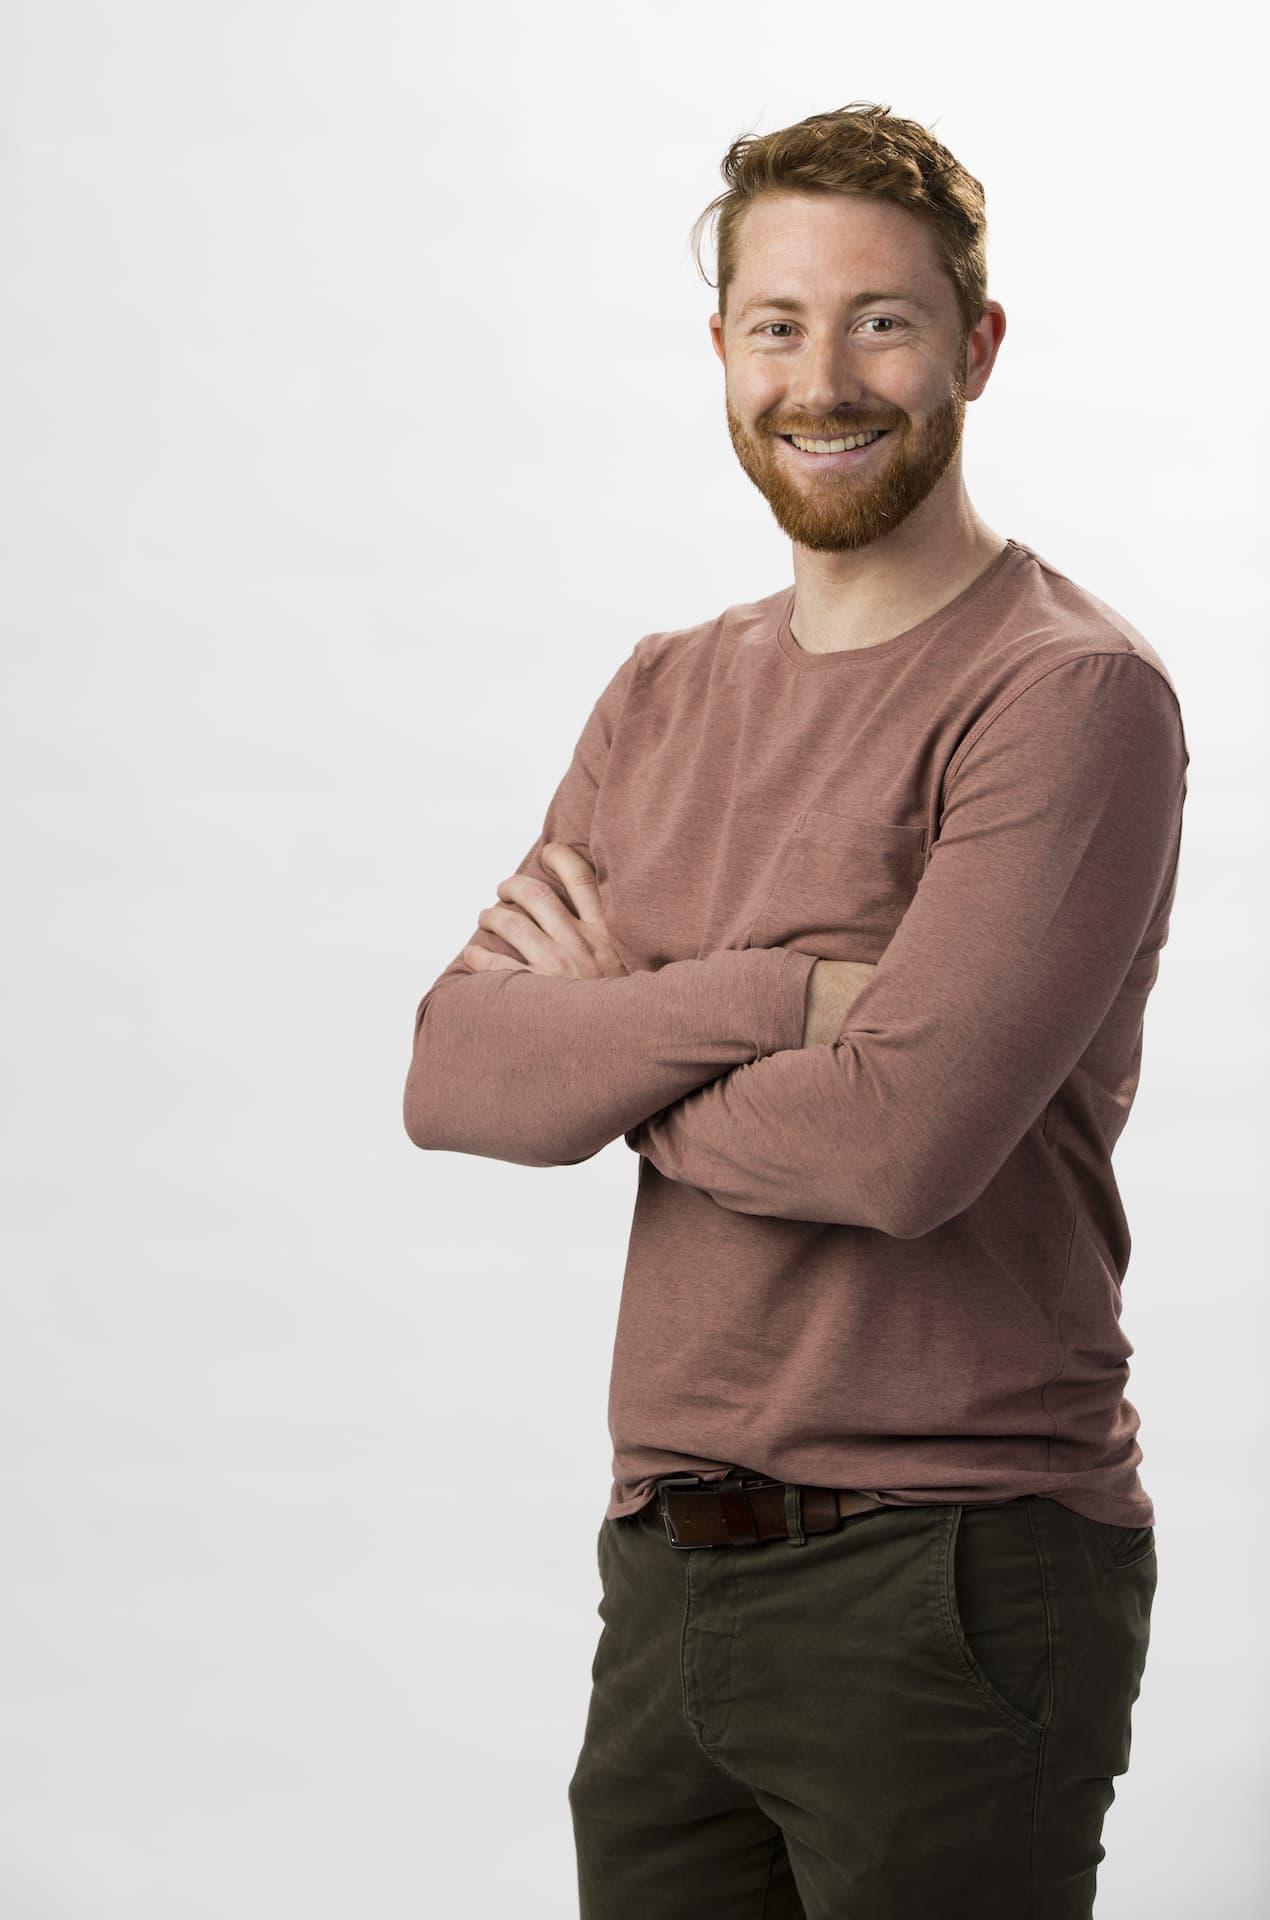 Philipp Frey |Physiotherapeut und Personal Trainer Freiburg